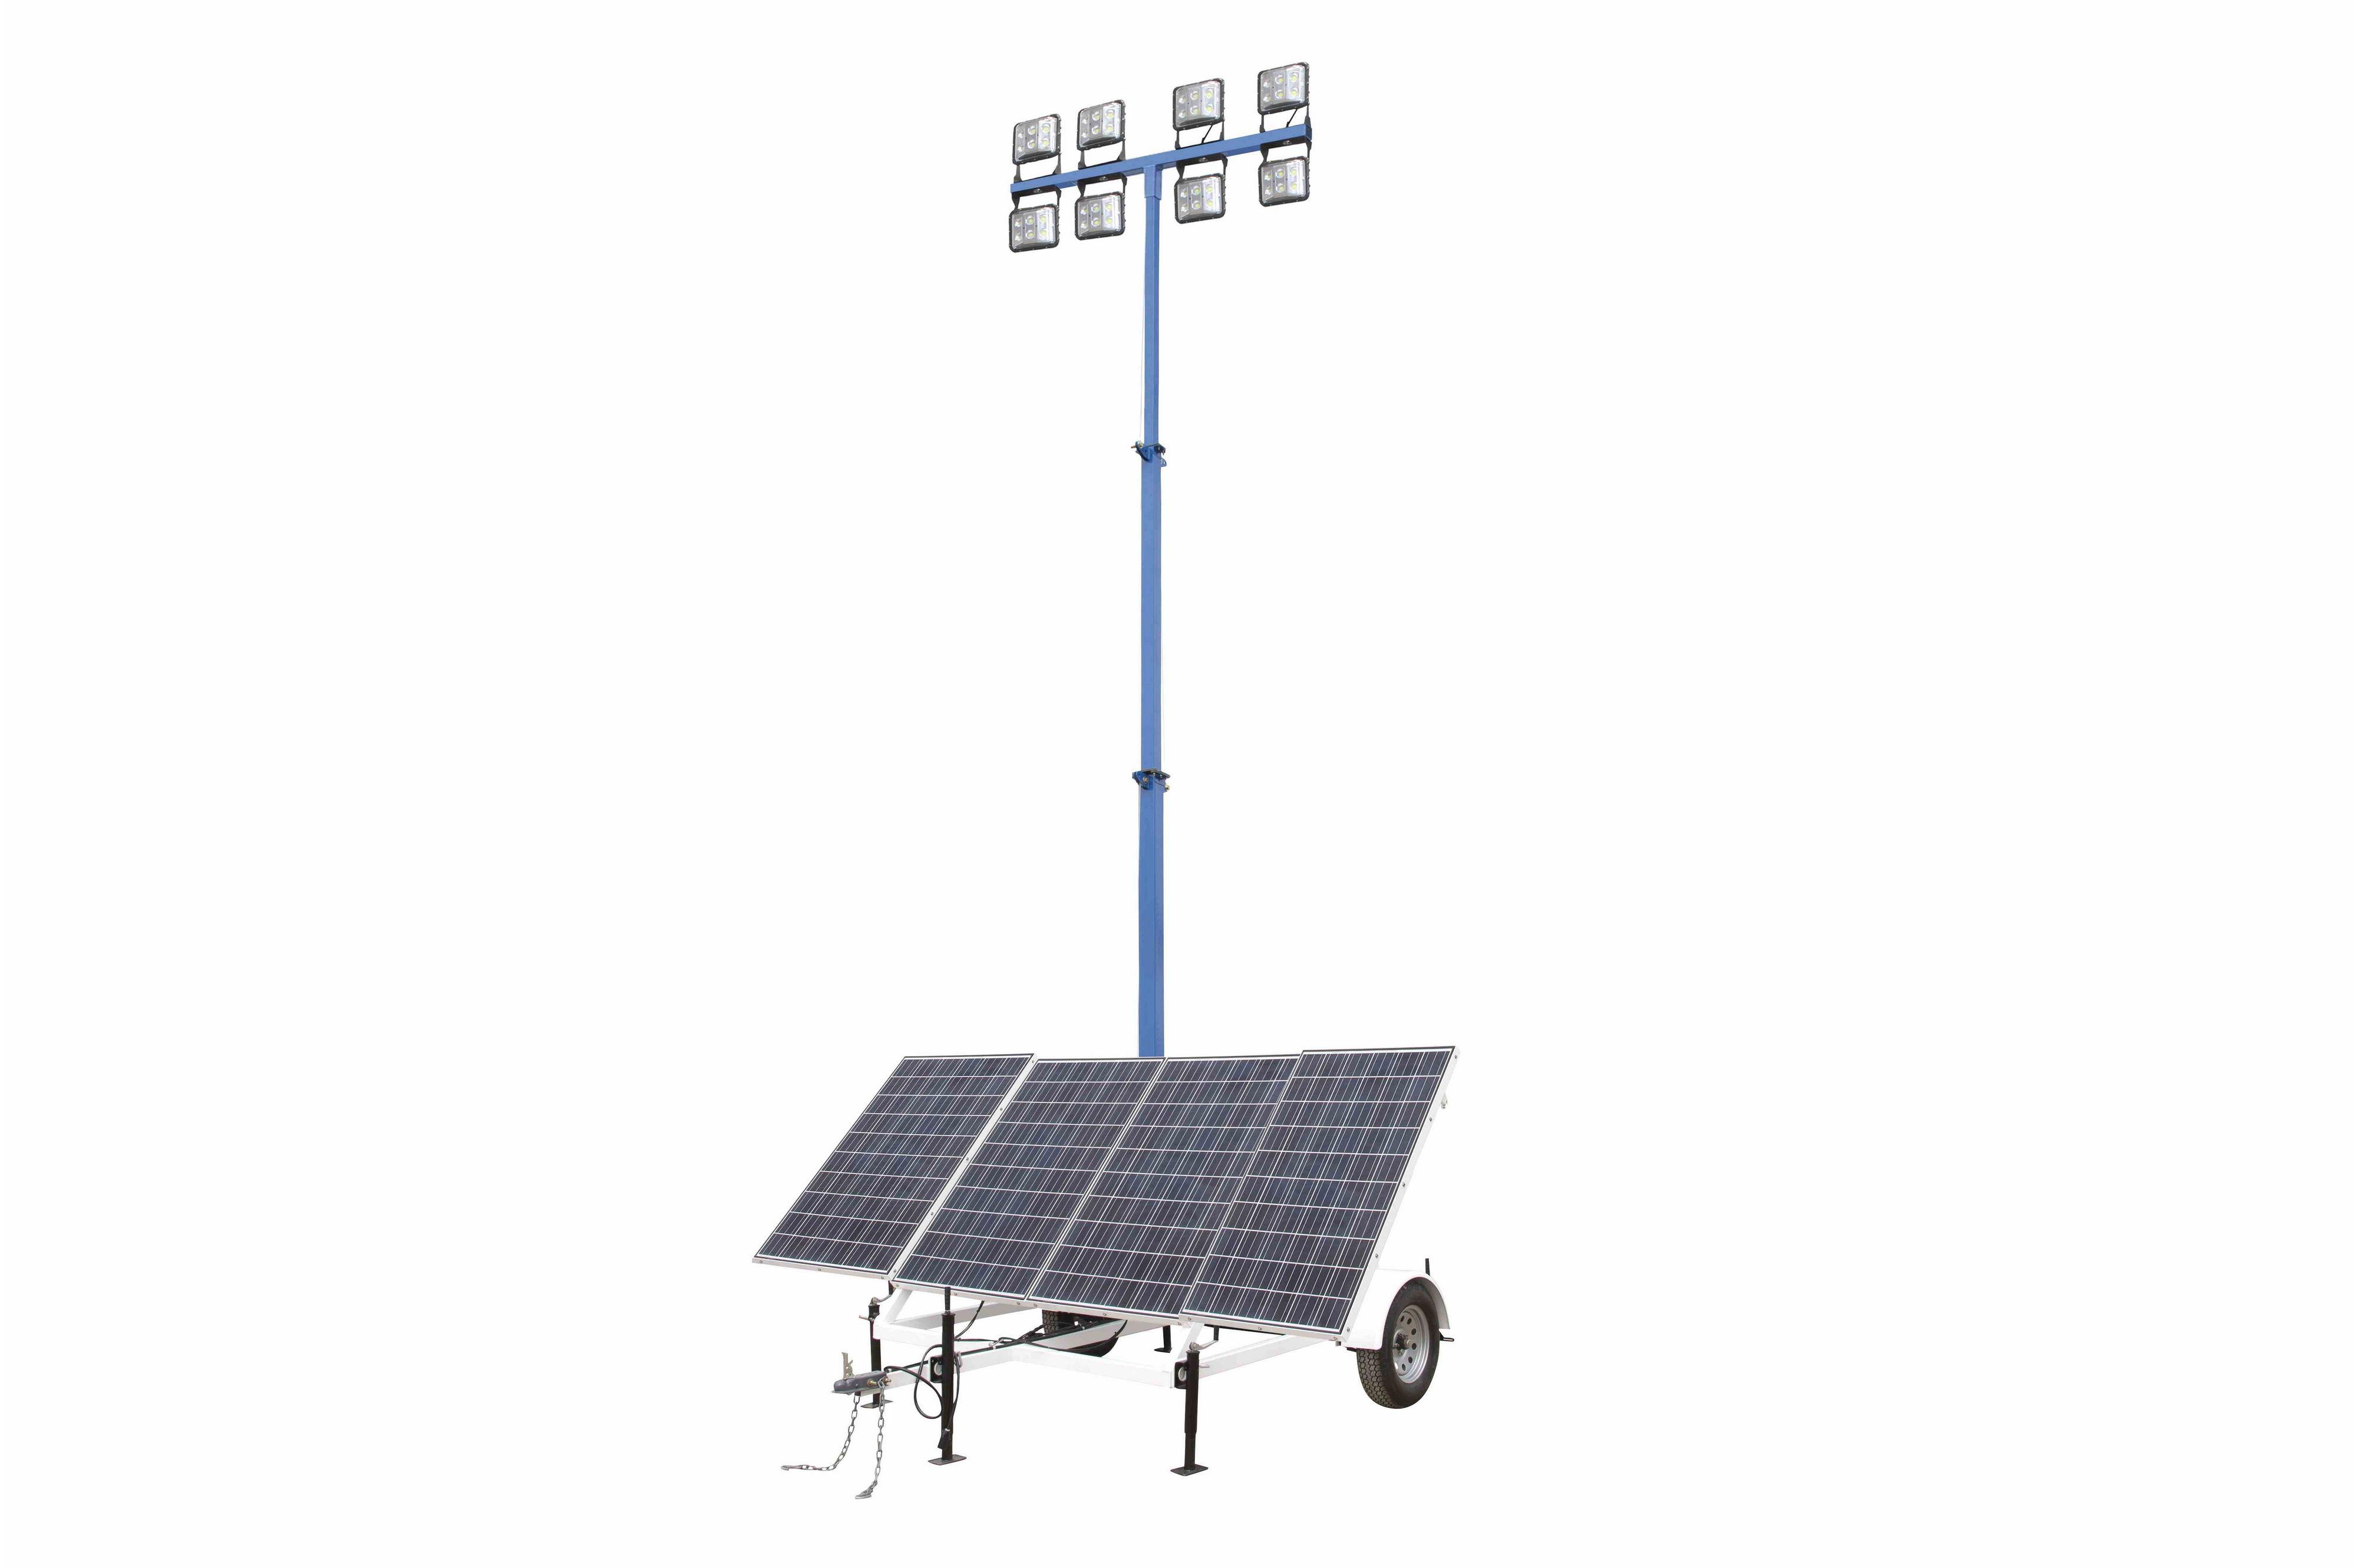 1.06 kW Solar Light Tower